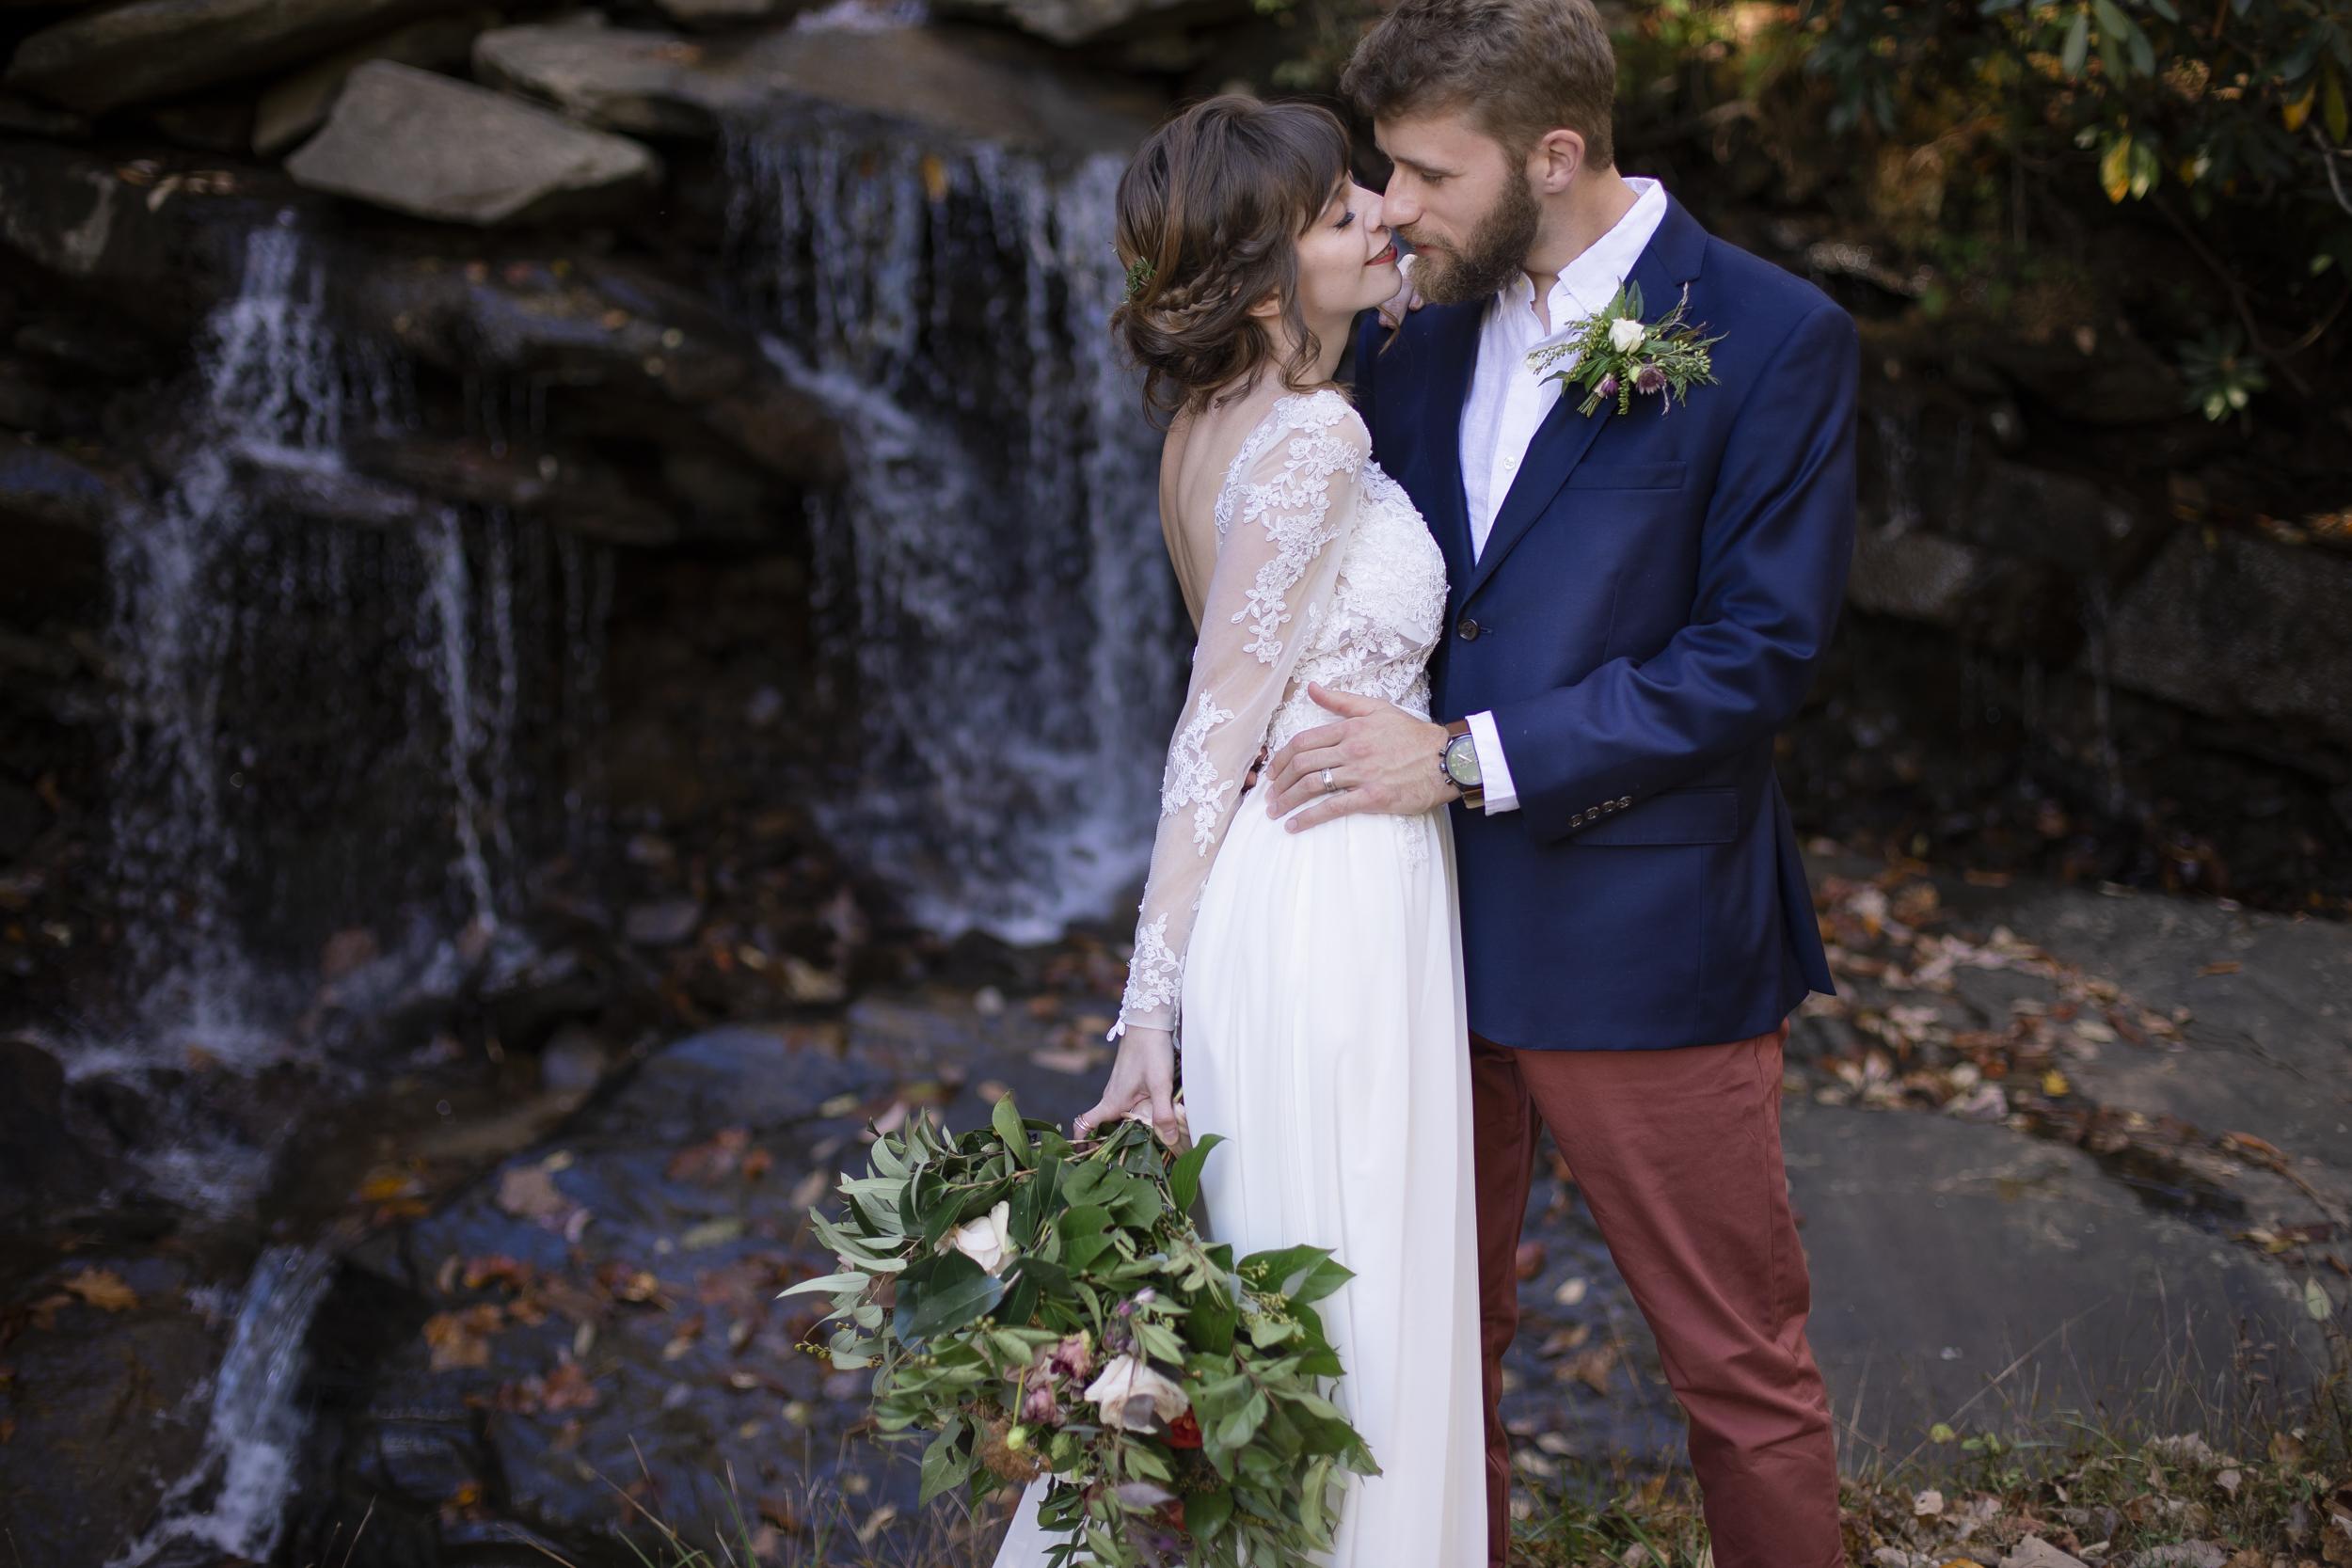 Laurel Falls Wedding October 2018_Allison and Josh__Lola Salon_Flora_Photo by Studio Misha Photography-109.jpg